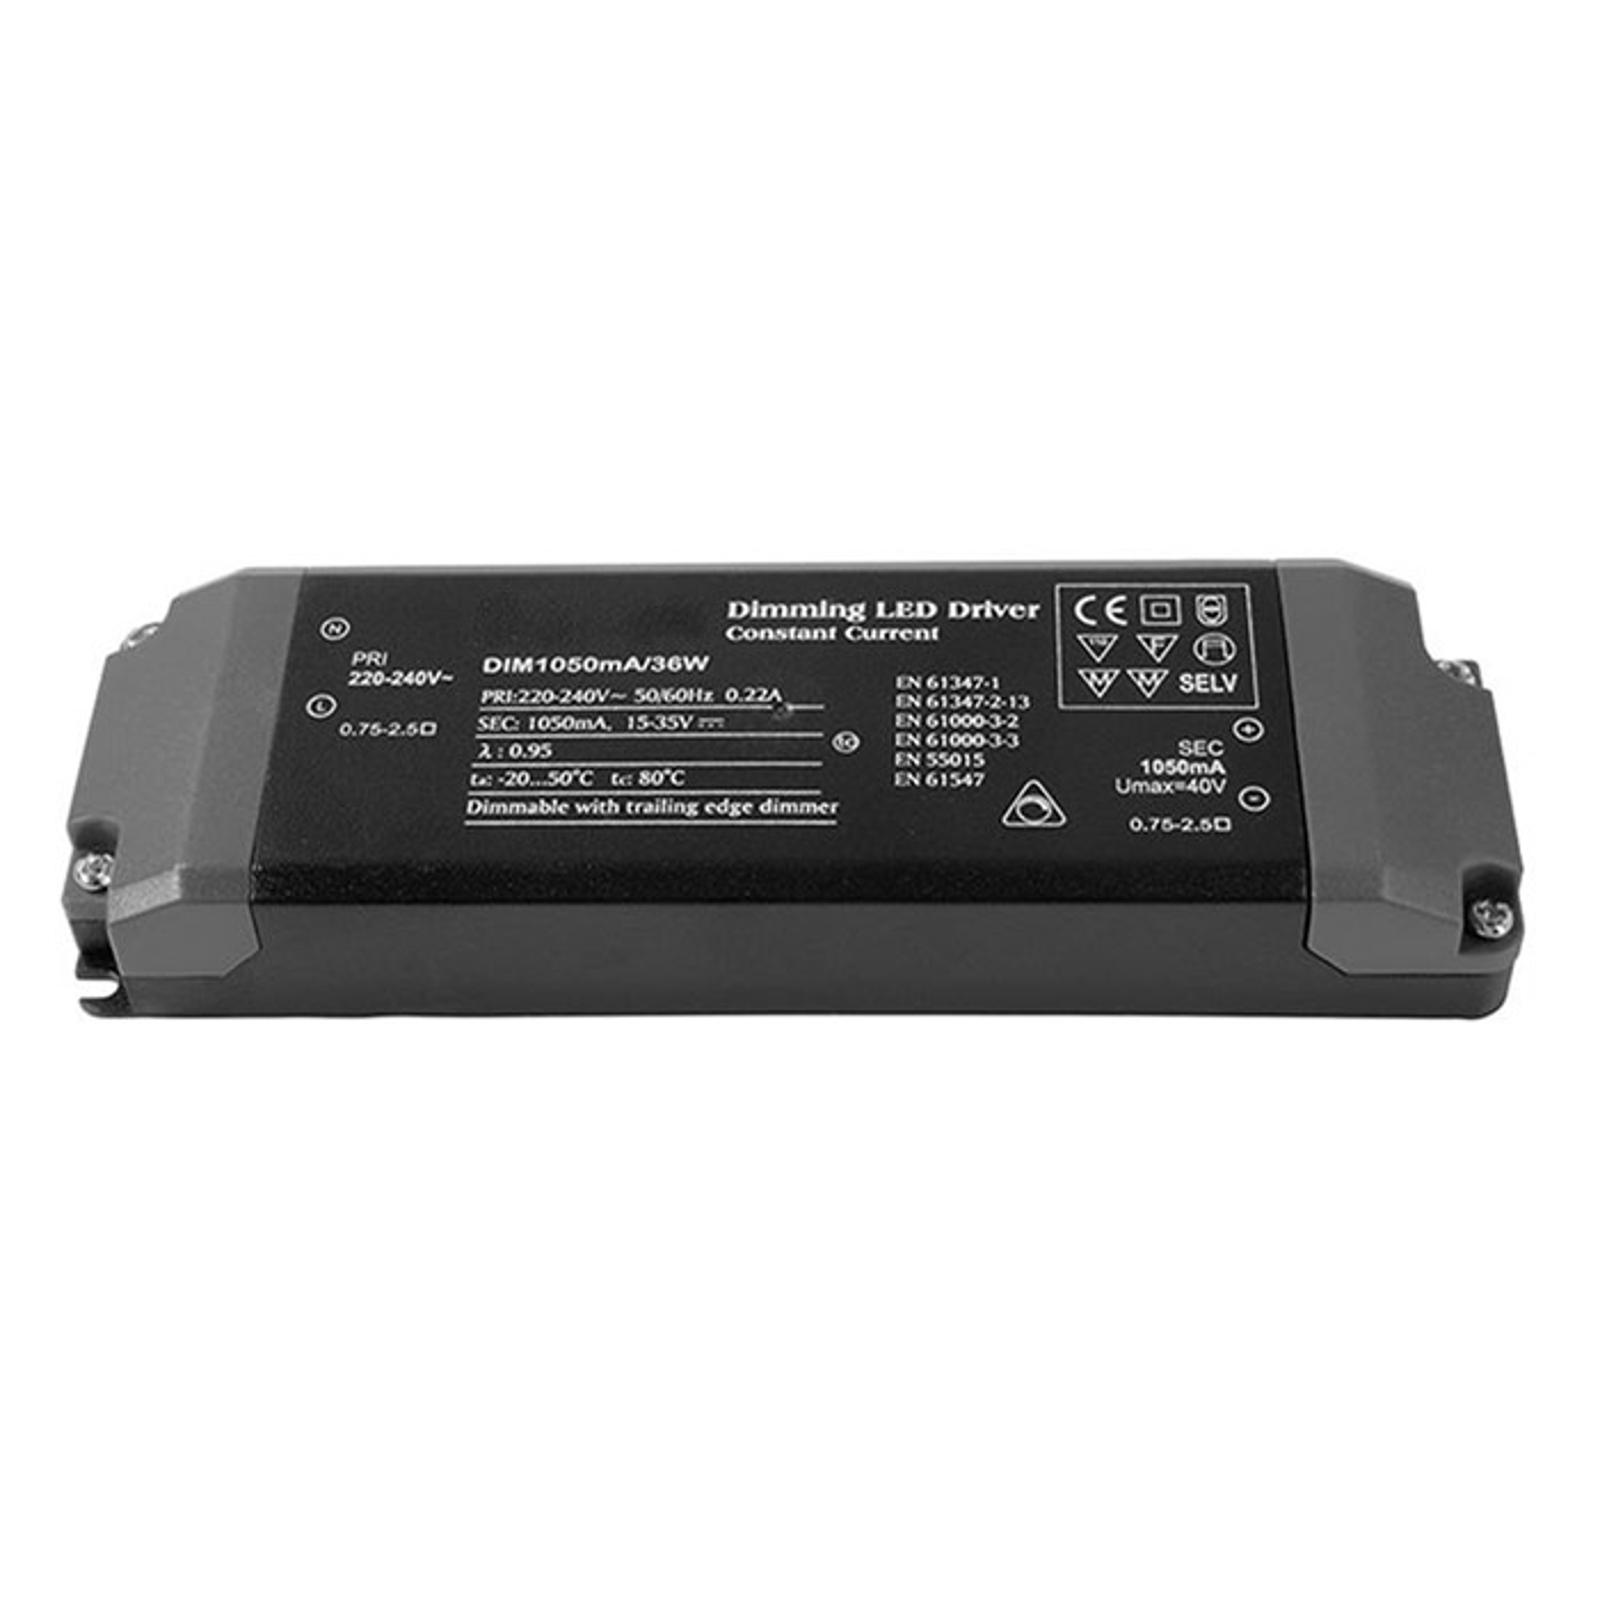 Konstantstrømforsyning LED, 1050 mA, 40 W, dimbar